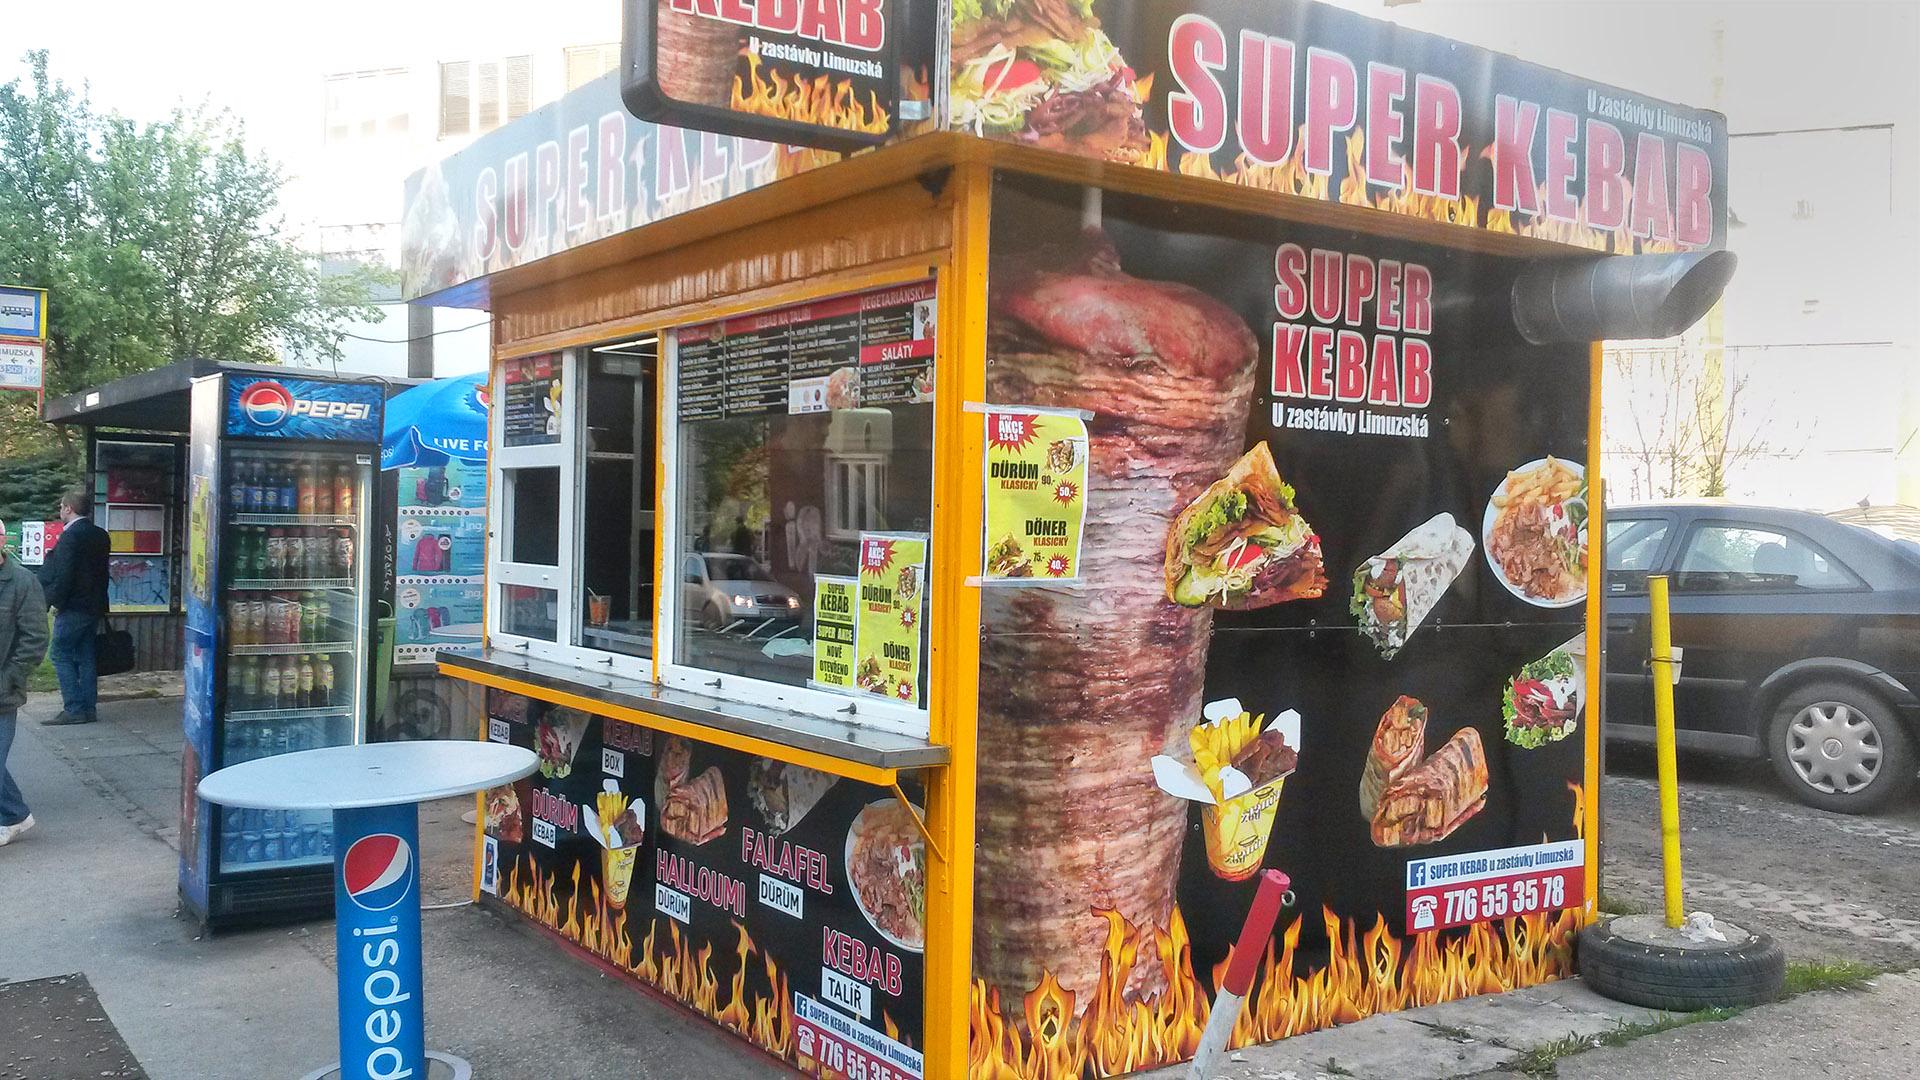 Super Döner Kebab Limuzská